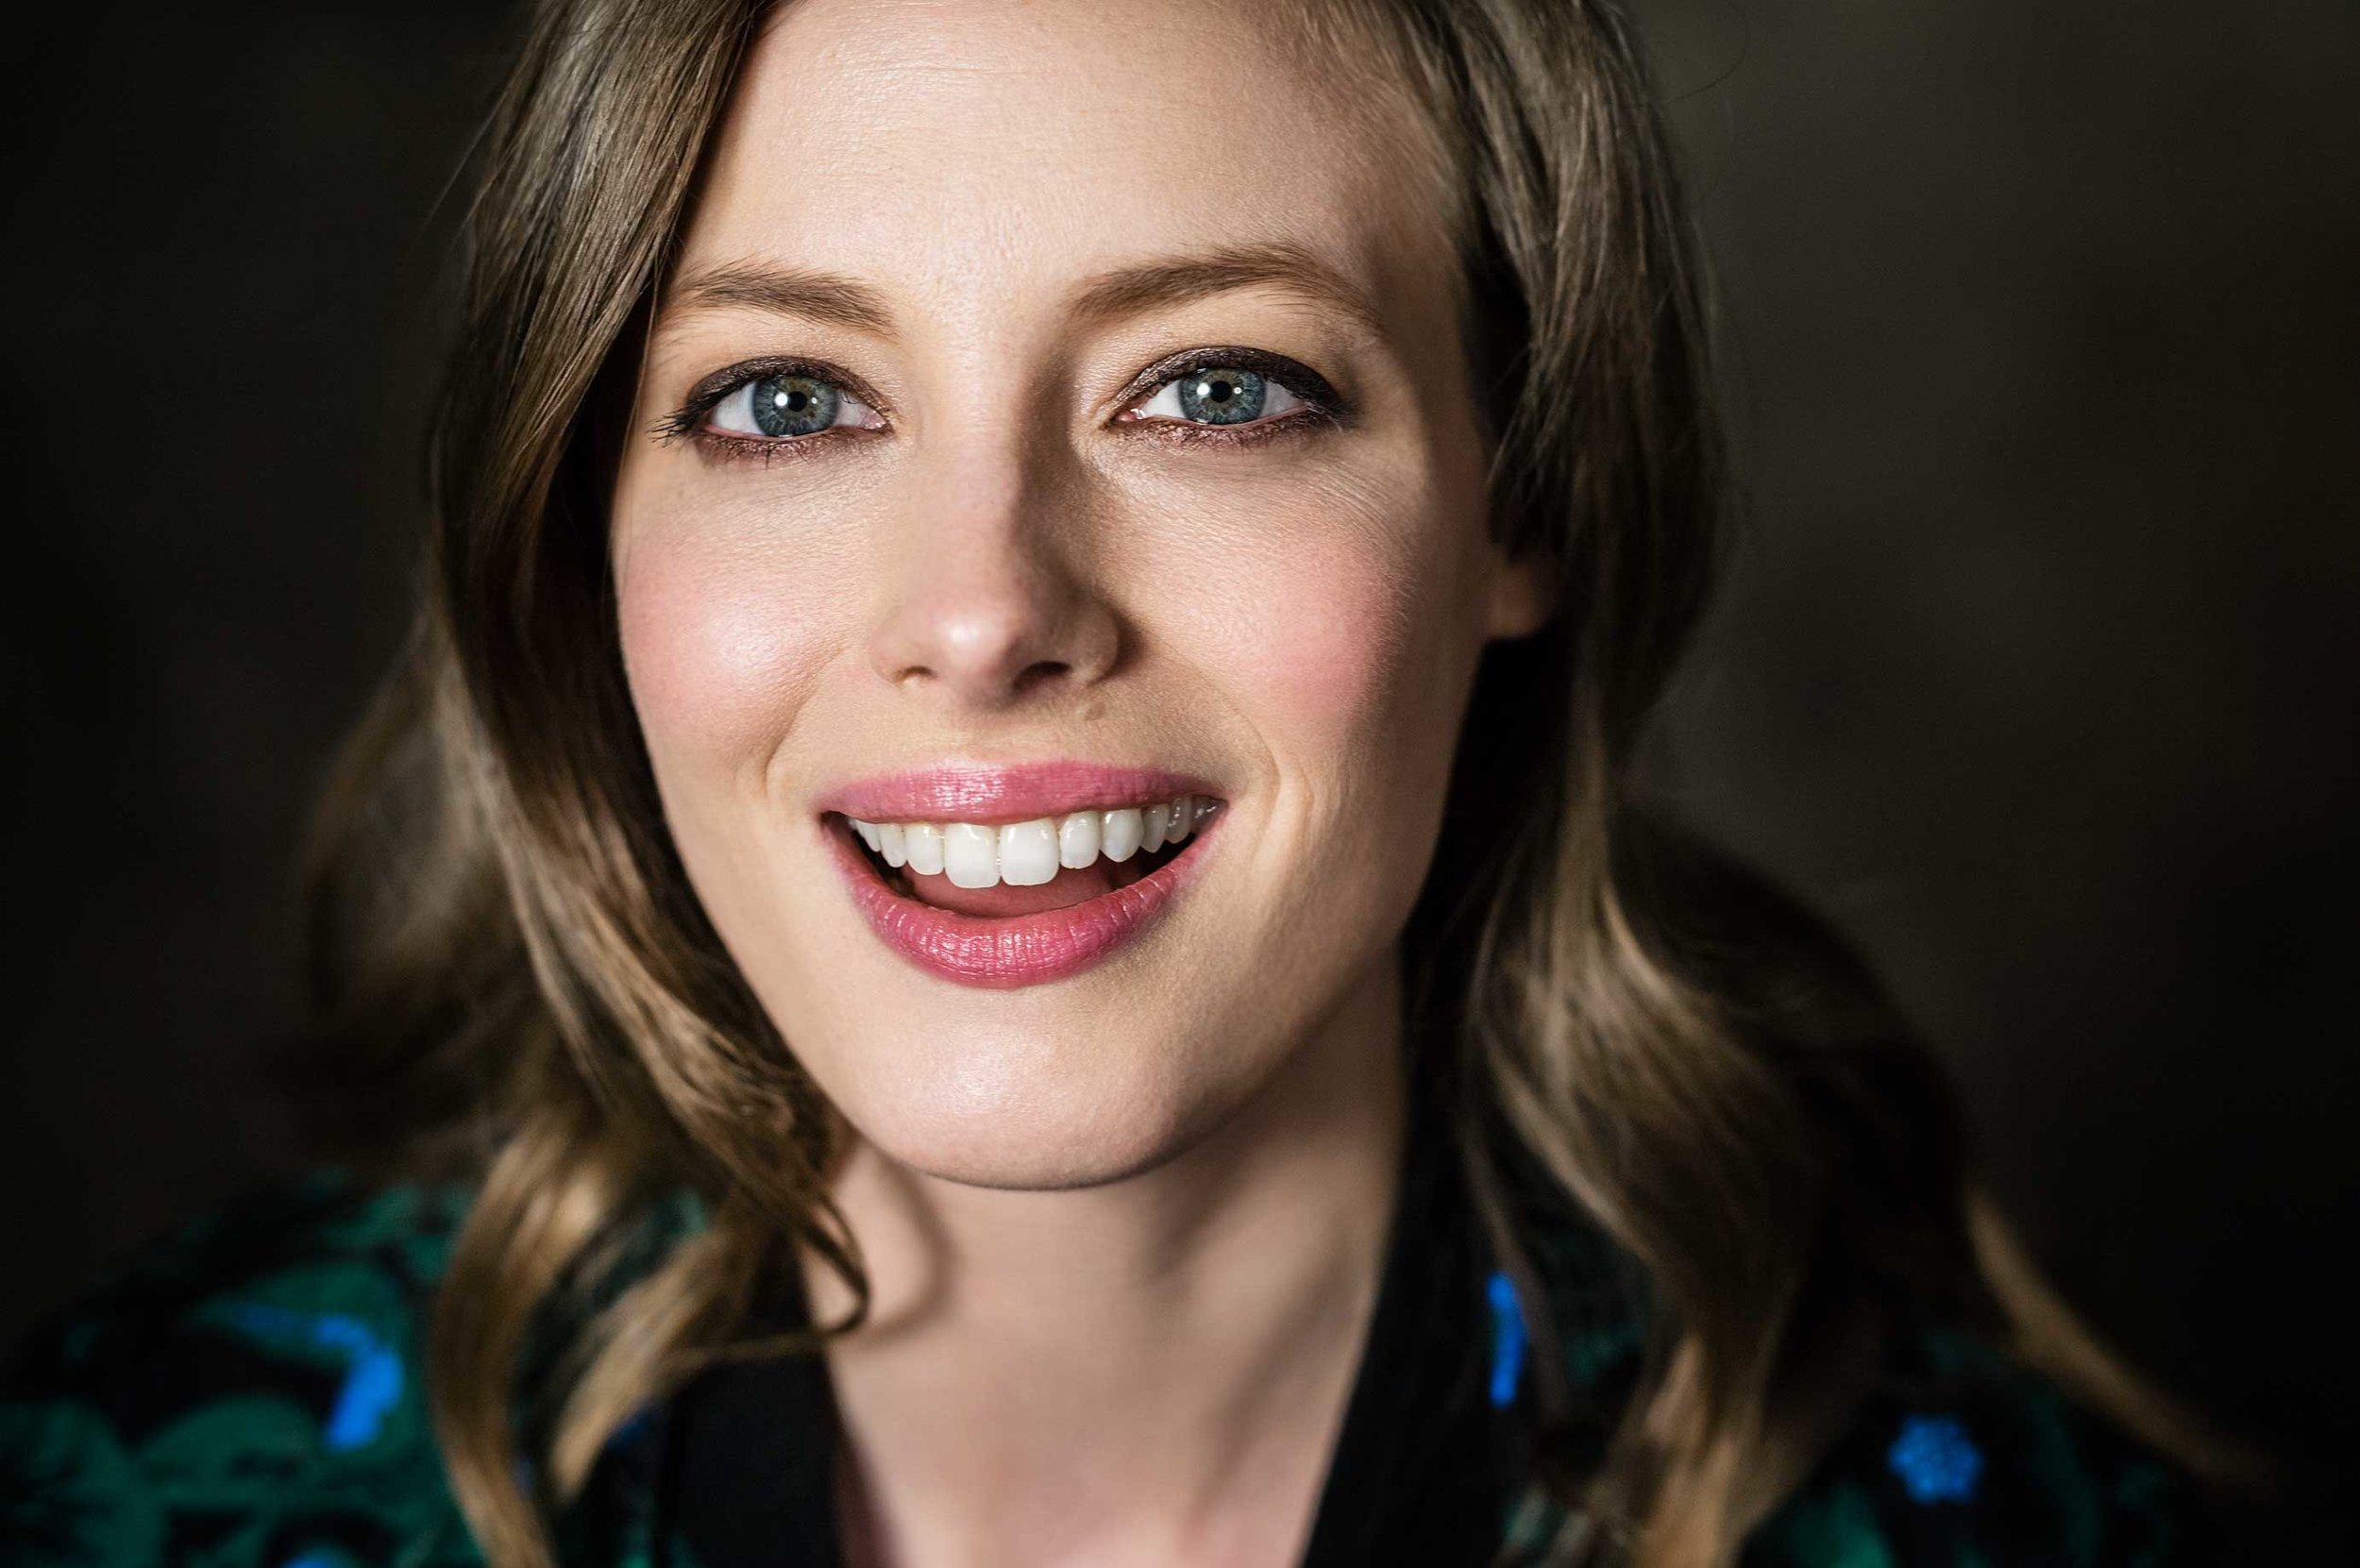 Gillian-Jacobs-Dean-3714-1.jpg